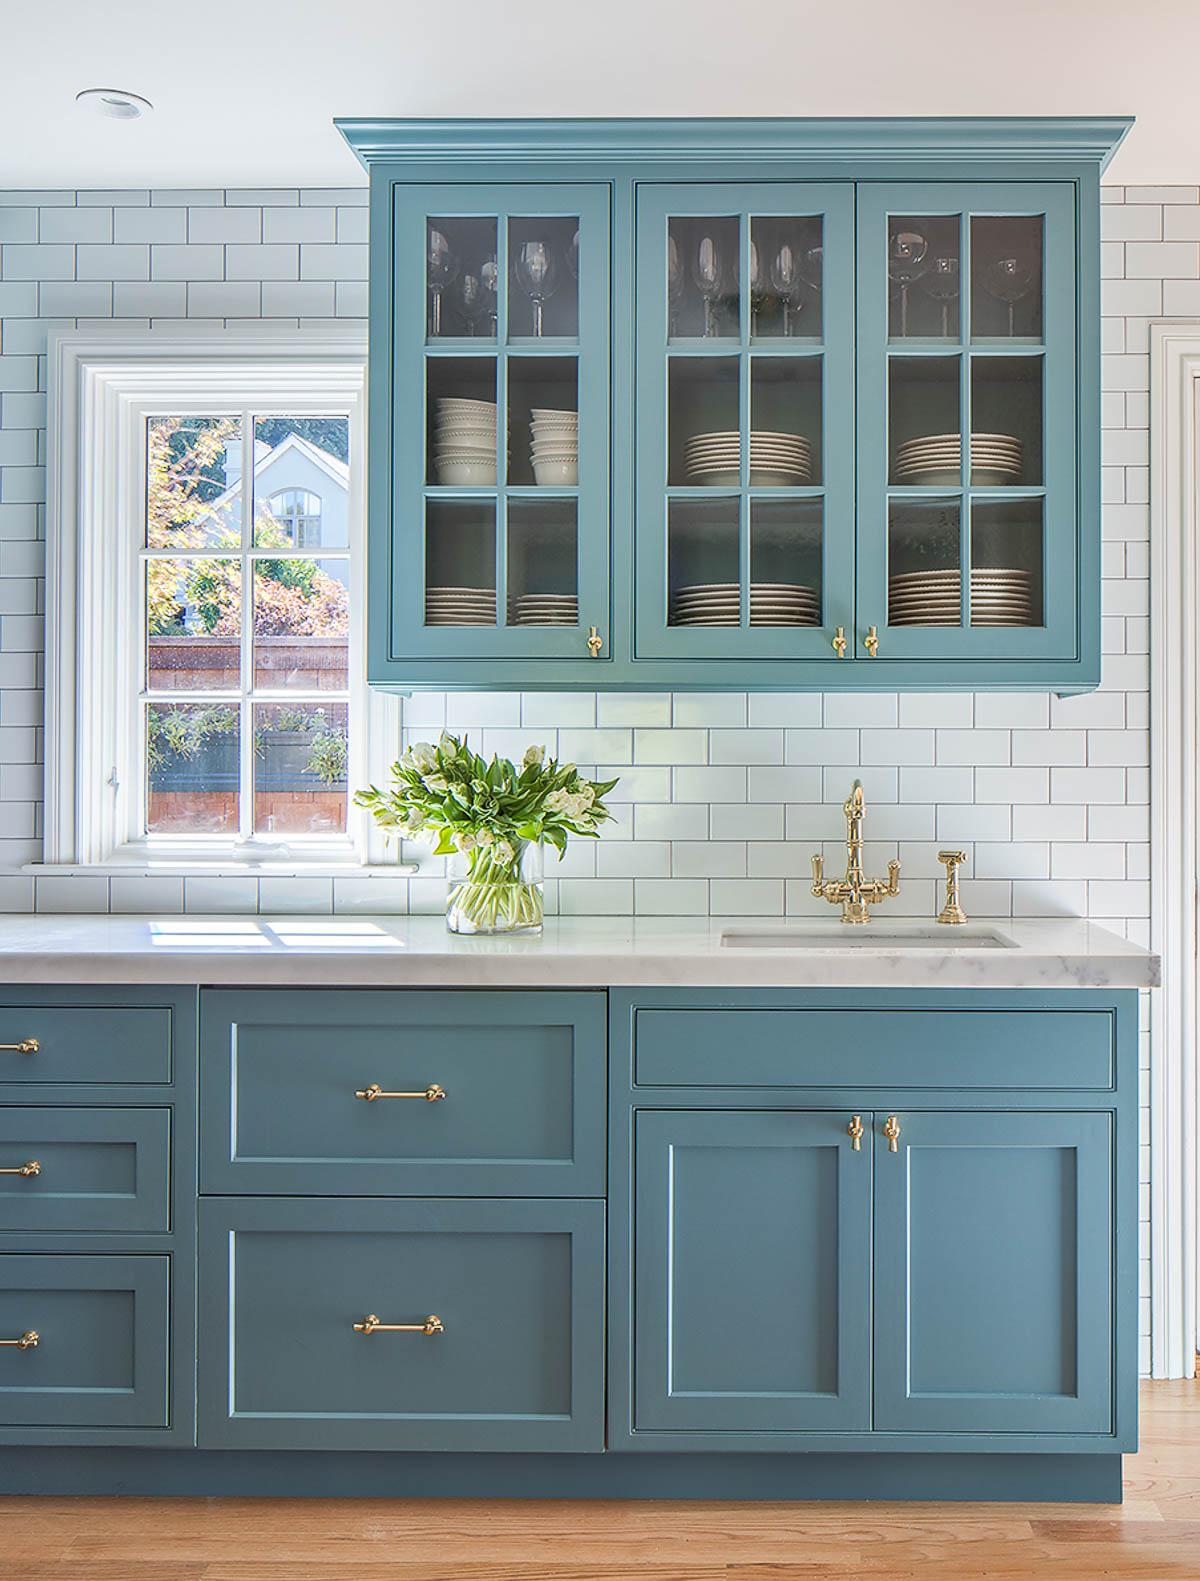 LMB_Interiors_Hillsborough_Green_Design_Kitchen_AFTER_3